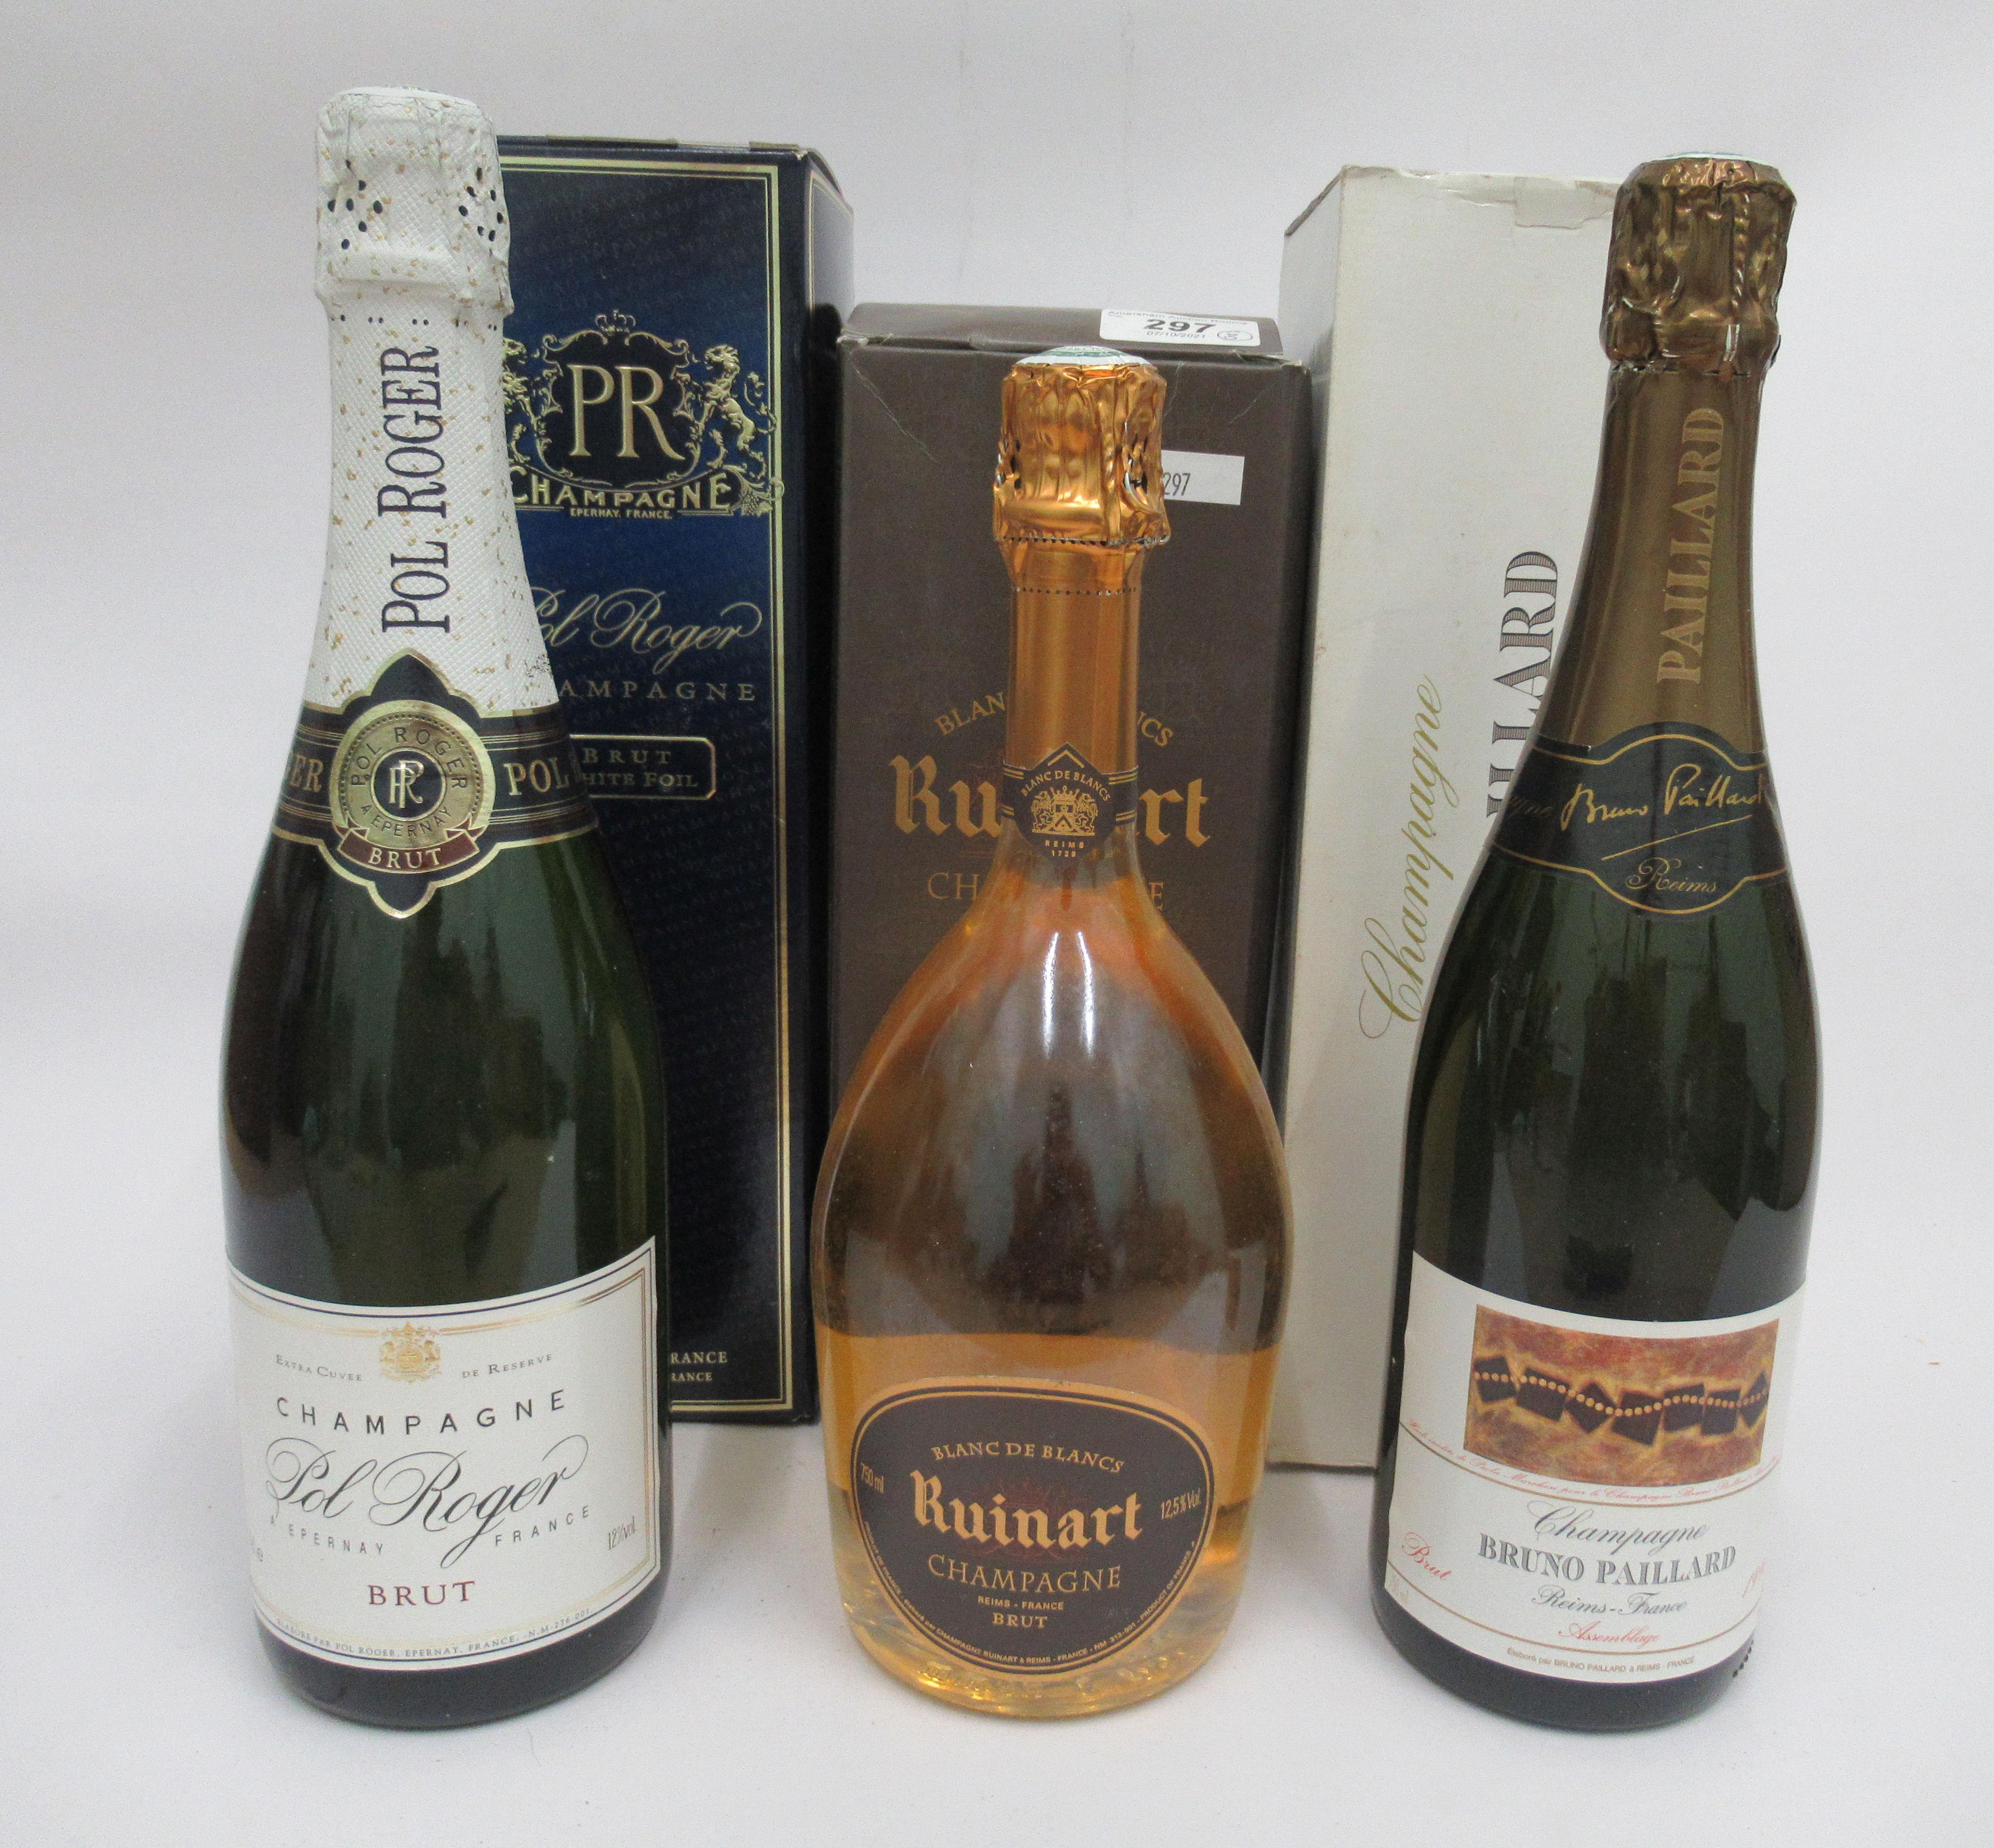 Wine, Champagne, viz. a Pol Roger; a Ruinart Blanc de Blancs; and a 1996 Bruno Paillard each boxed